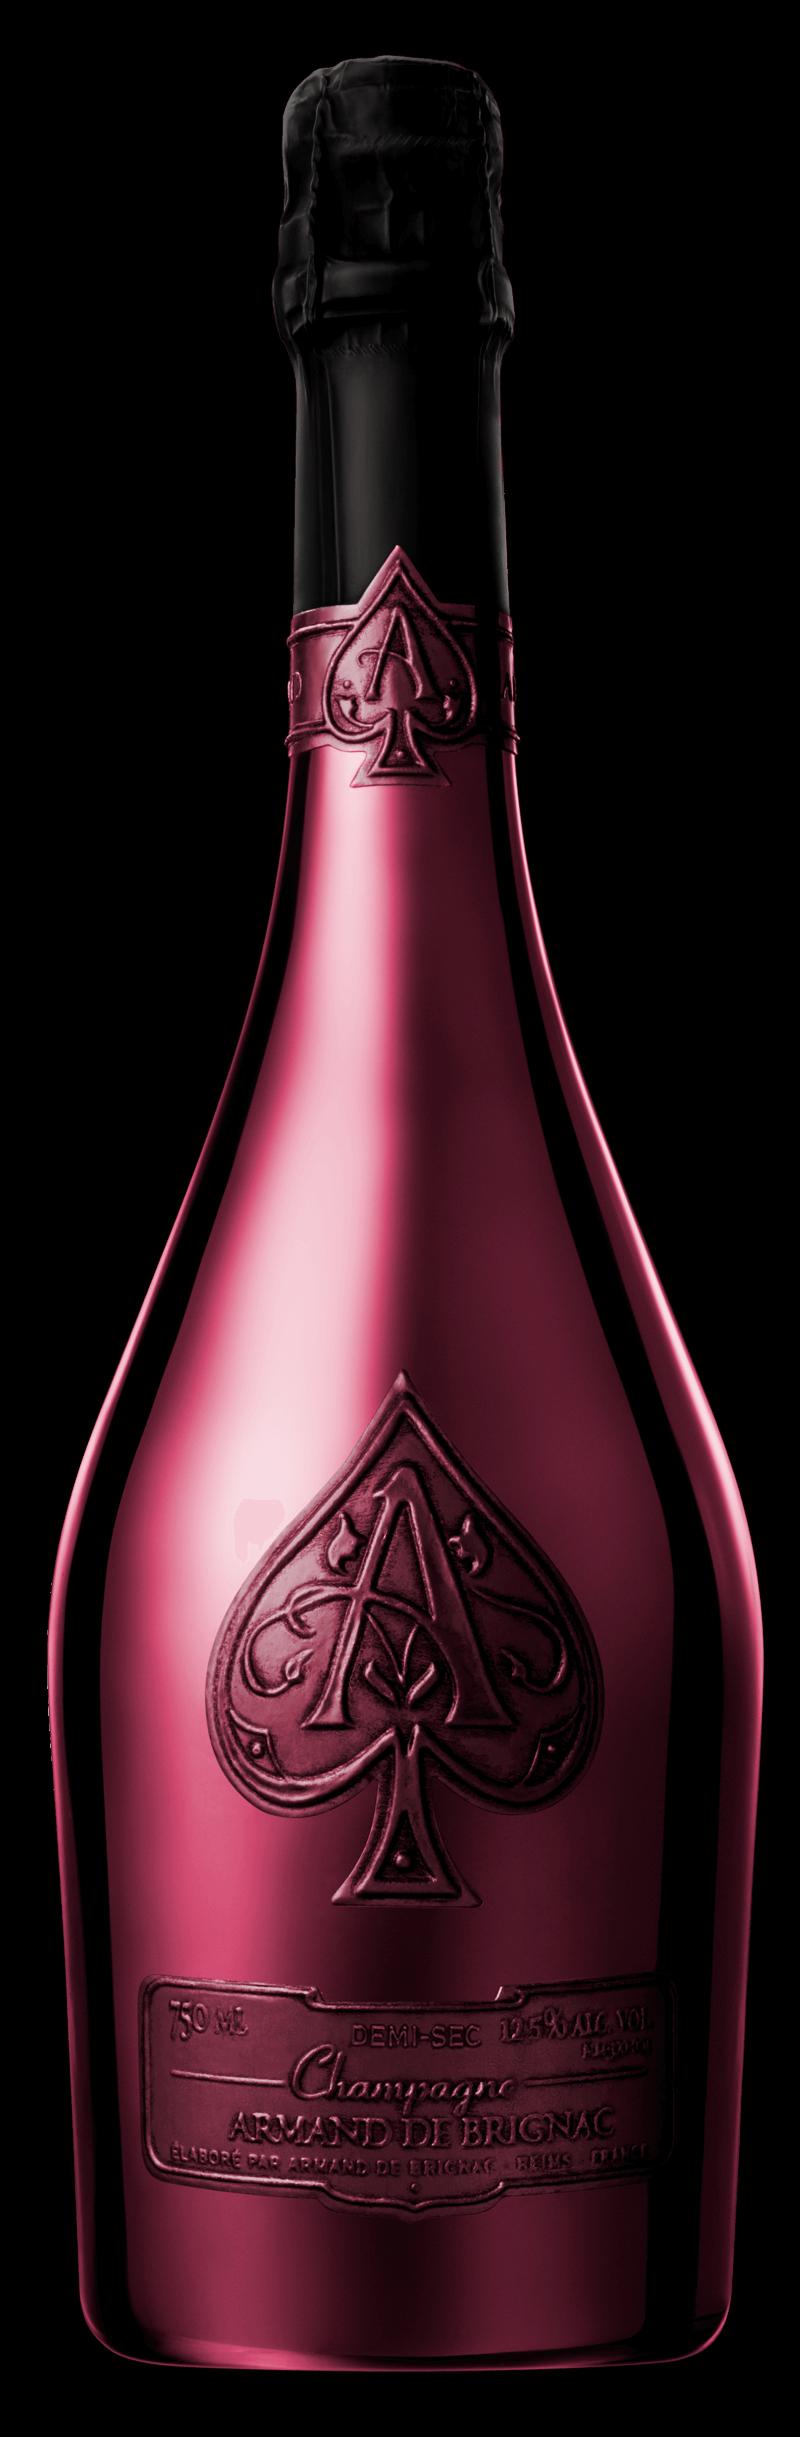 Demi Sec - Armand de Brignac Champagne